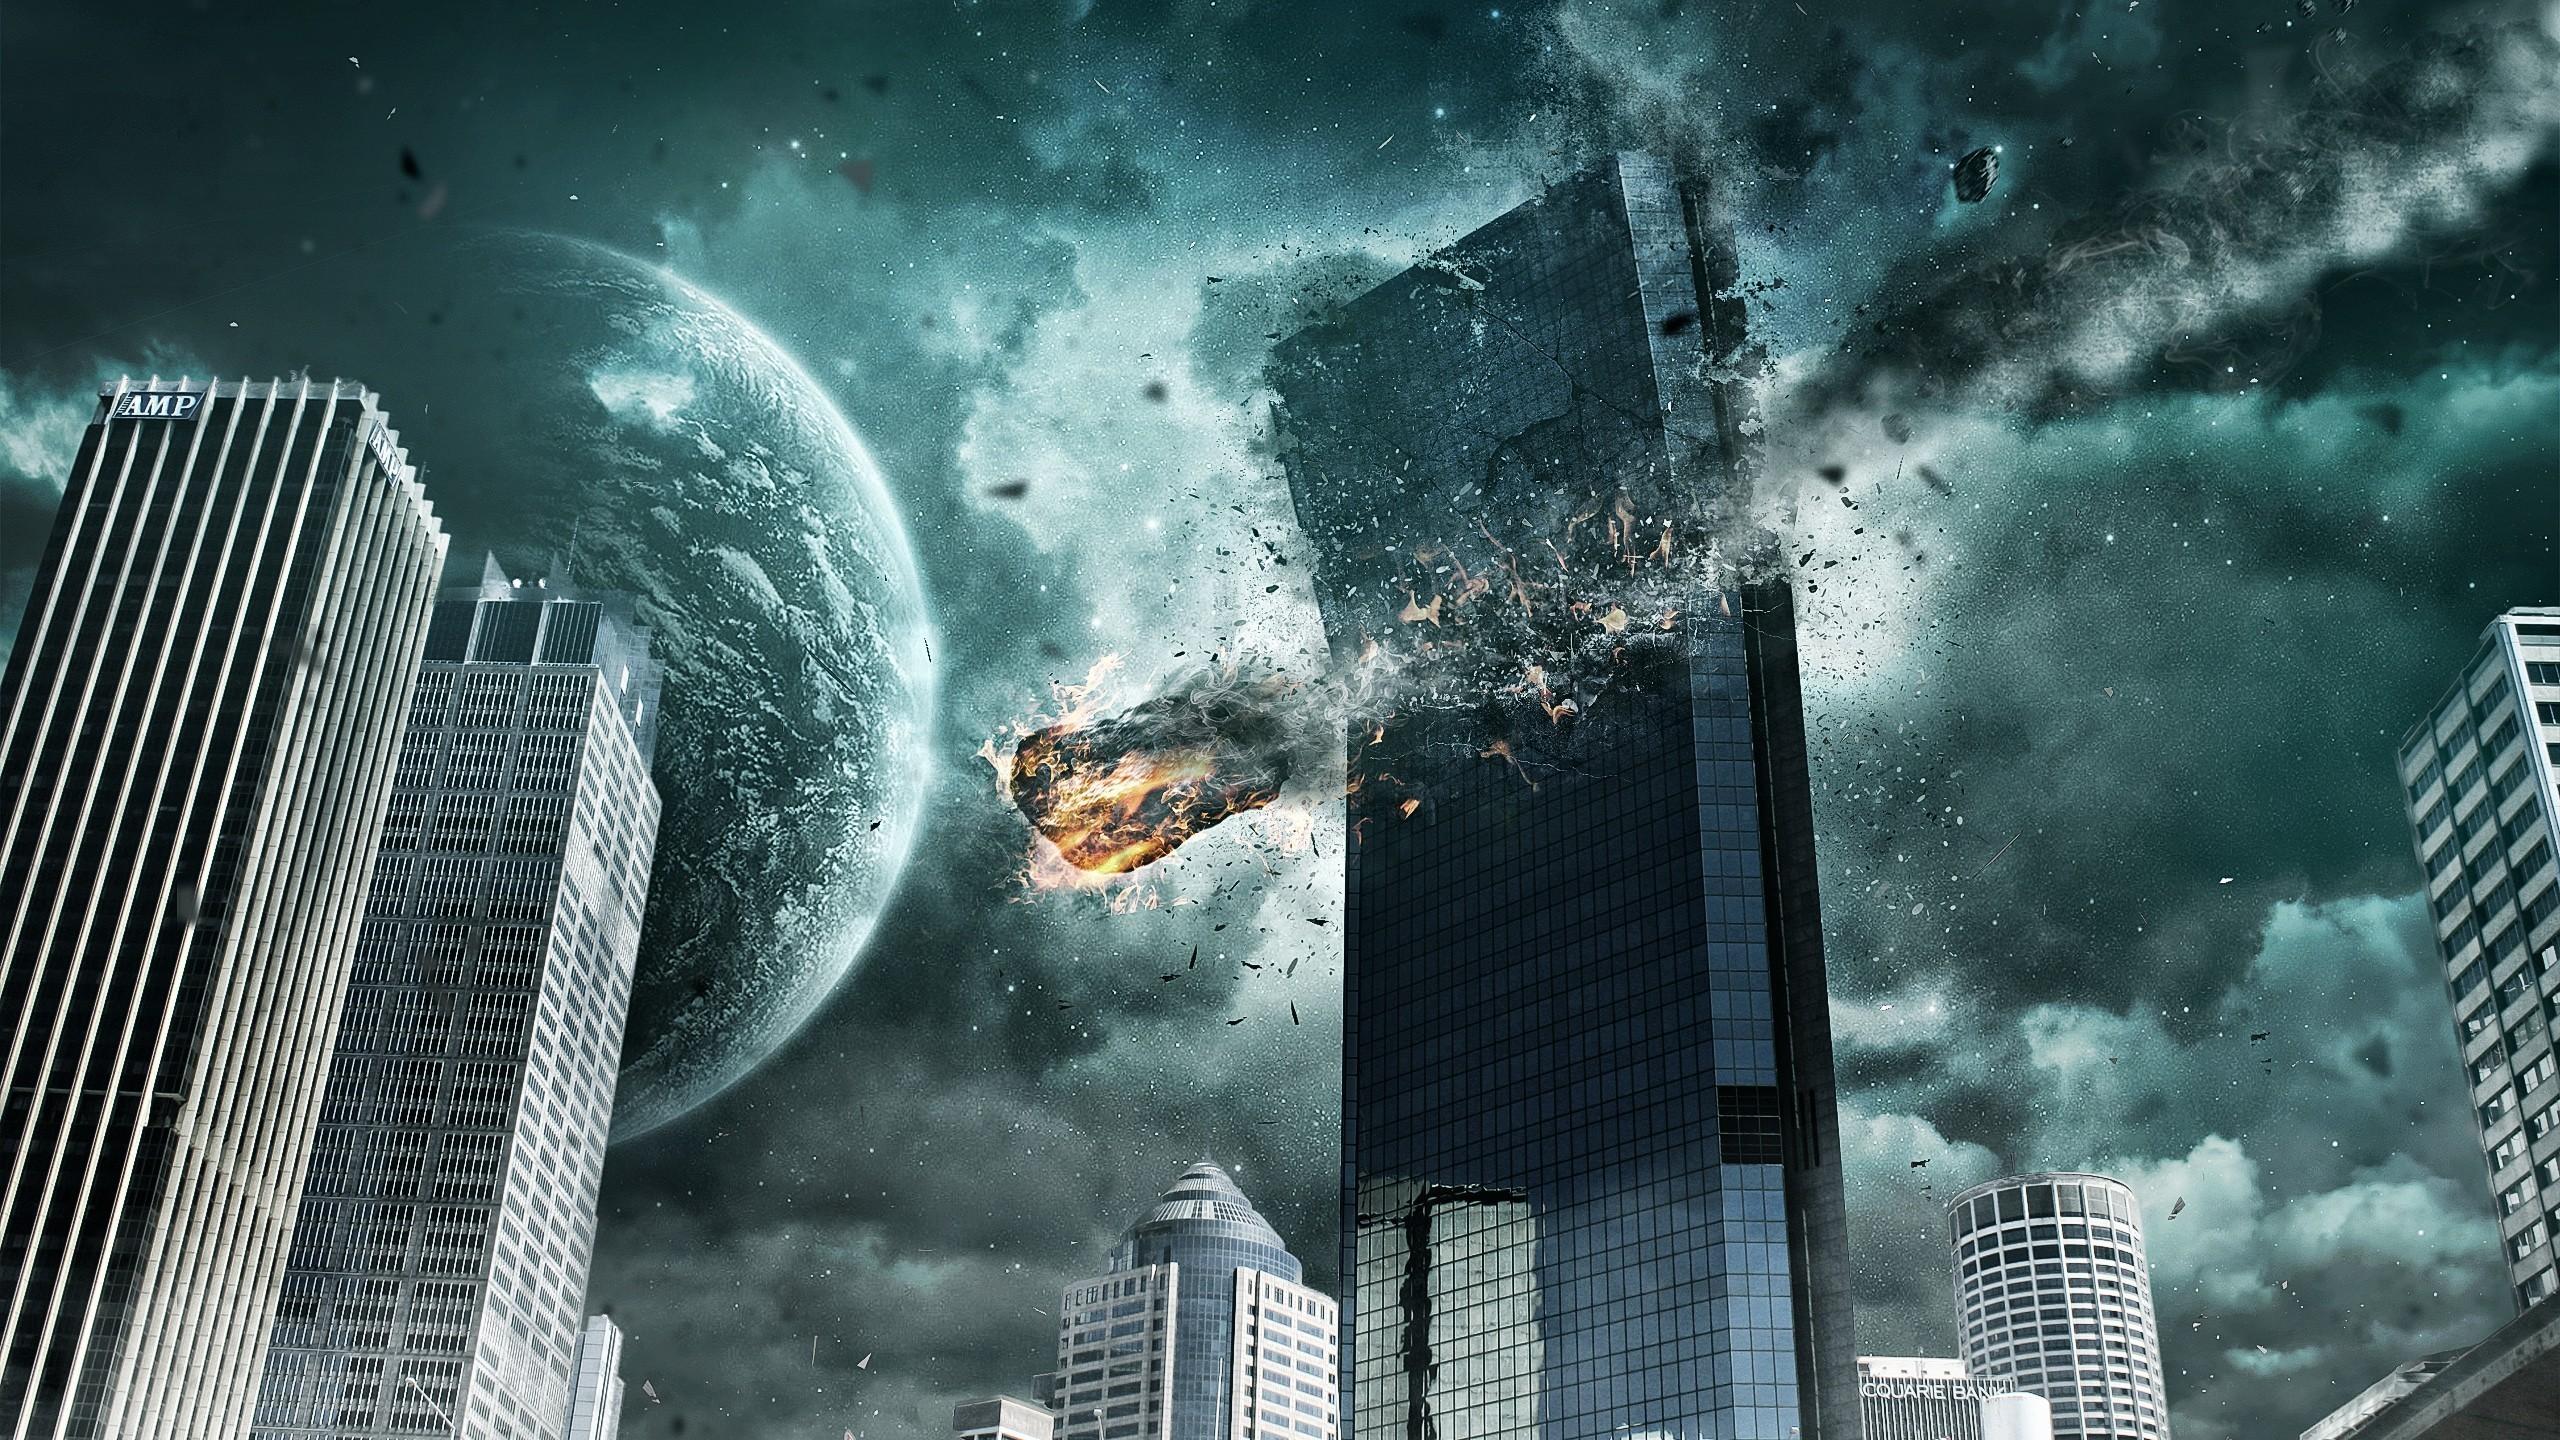 wallpaper.wiki-Meteorite-Crash-Digital-Art-2560-x-